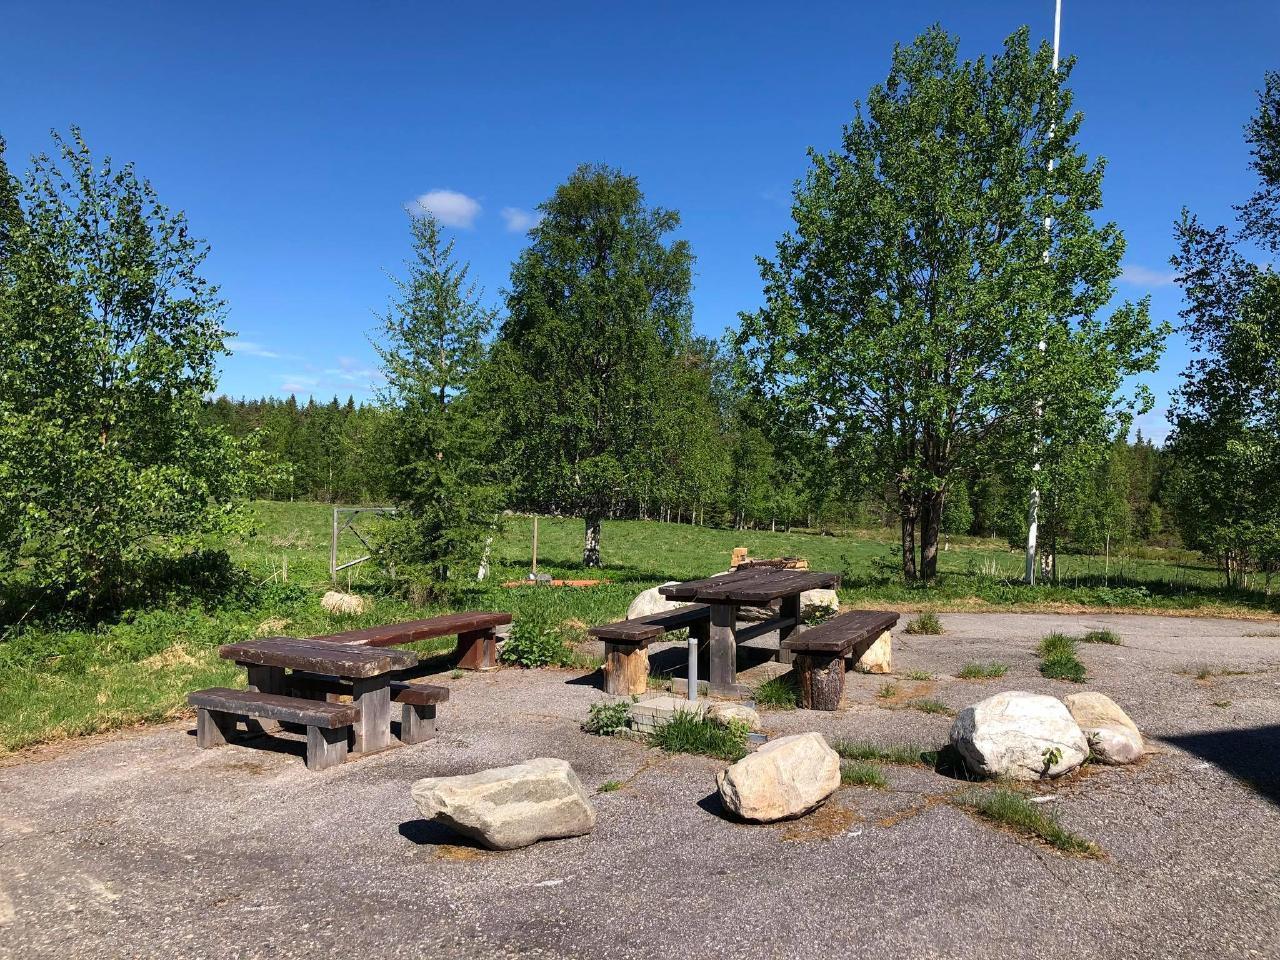 Maison de vacances Urlaub in der schönsten Gegend Finnlands (2177850), Suomussalmi, , Centre de la Finlande - Oulu, Finlande, image 12